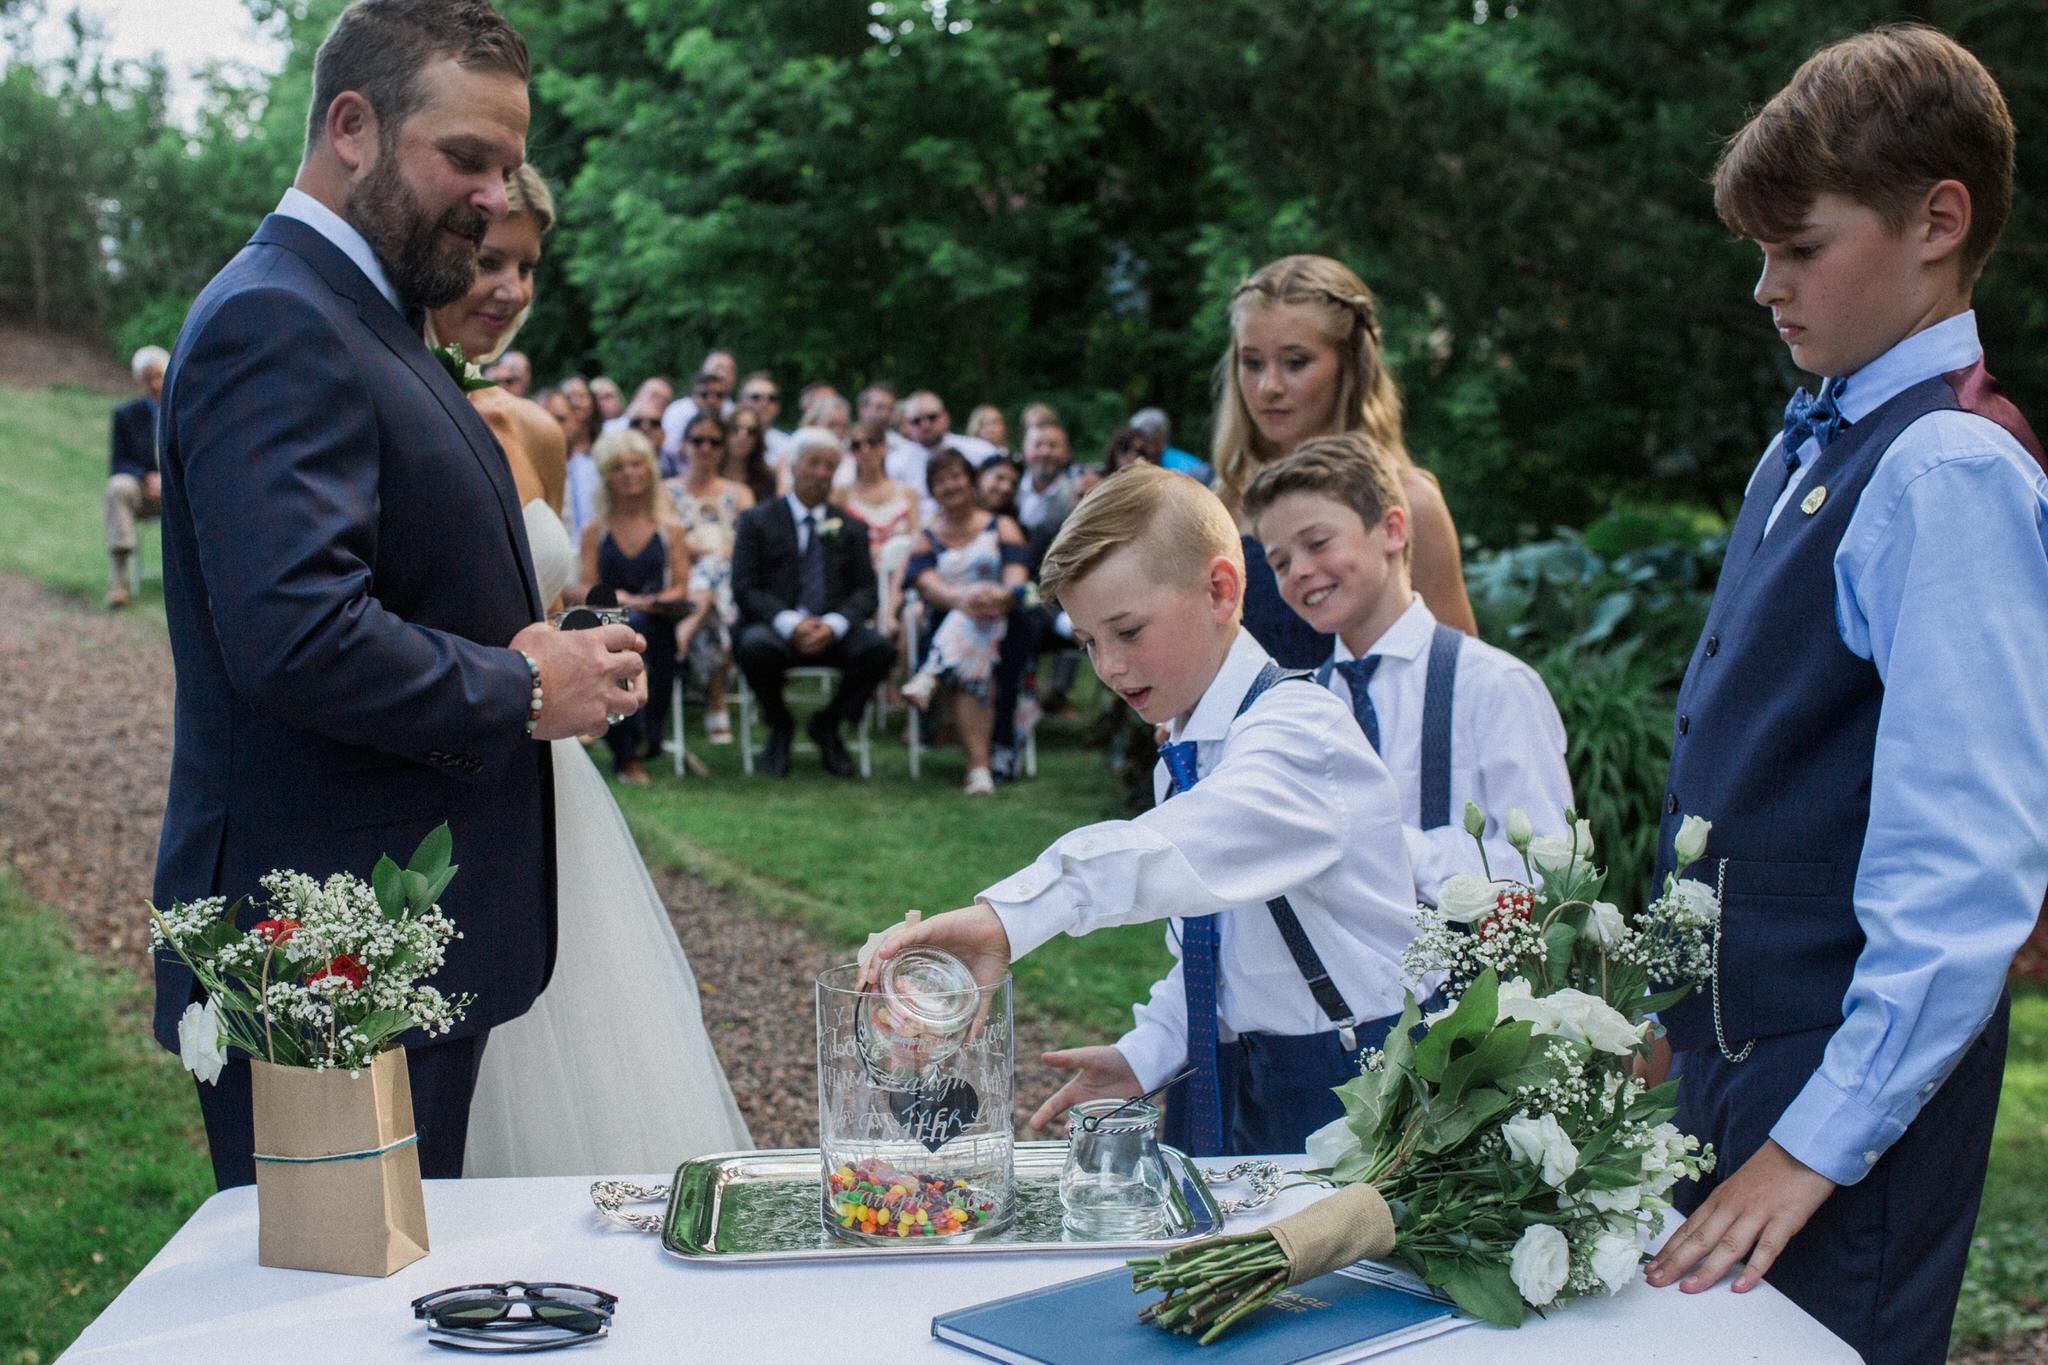 Harvest Restaurant Wedding Brooklin Ontario - Candy ceremony